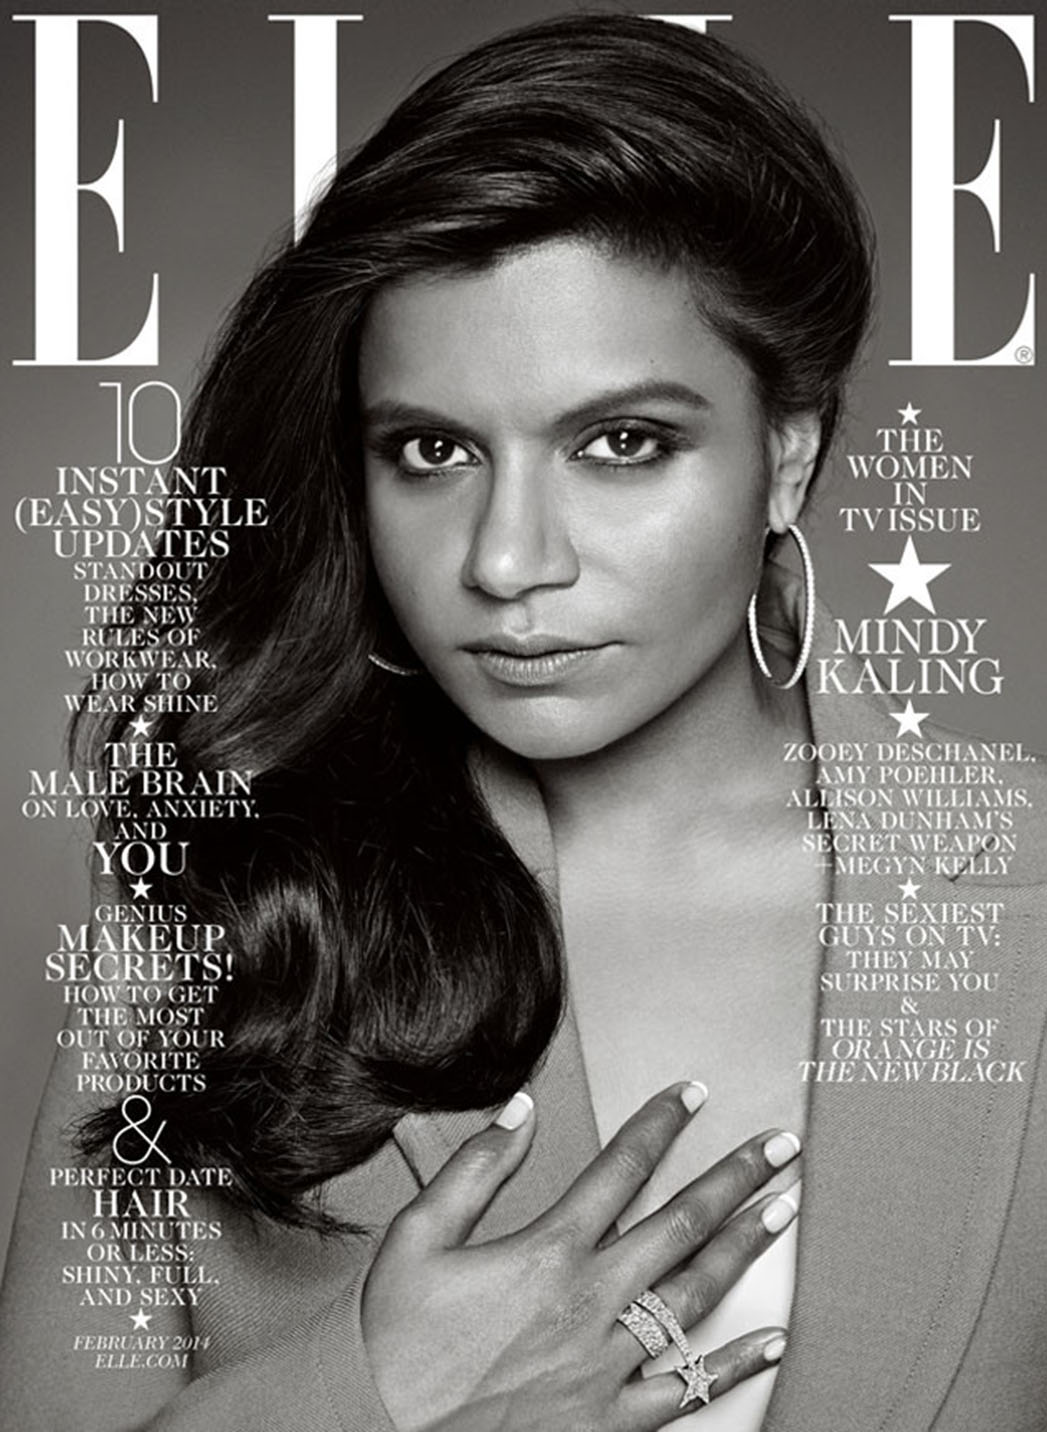 Mindy Kaling Elle Magazine Cover - P 2014